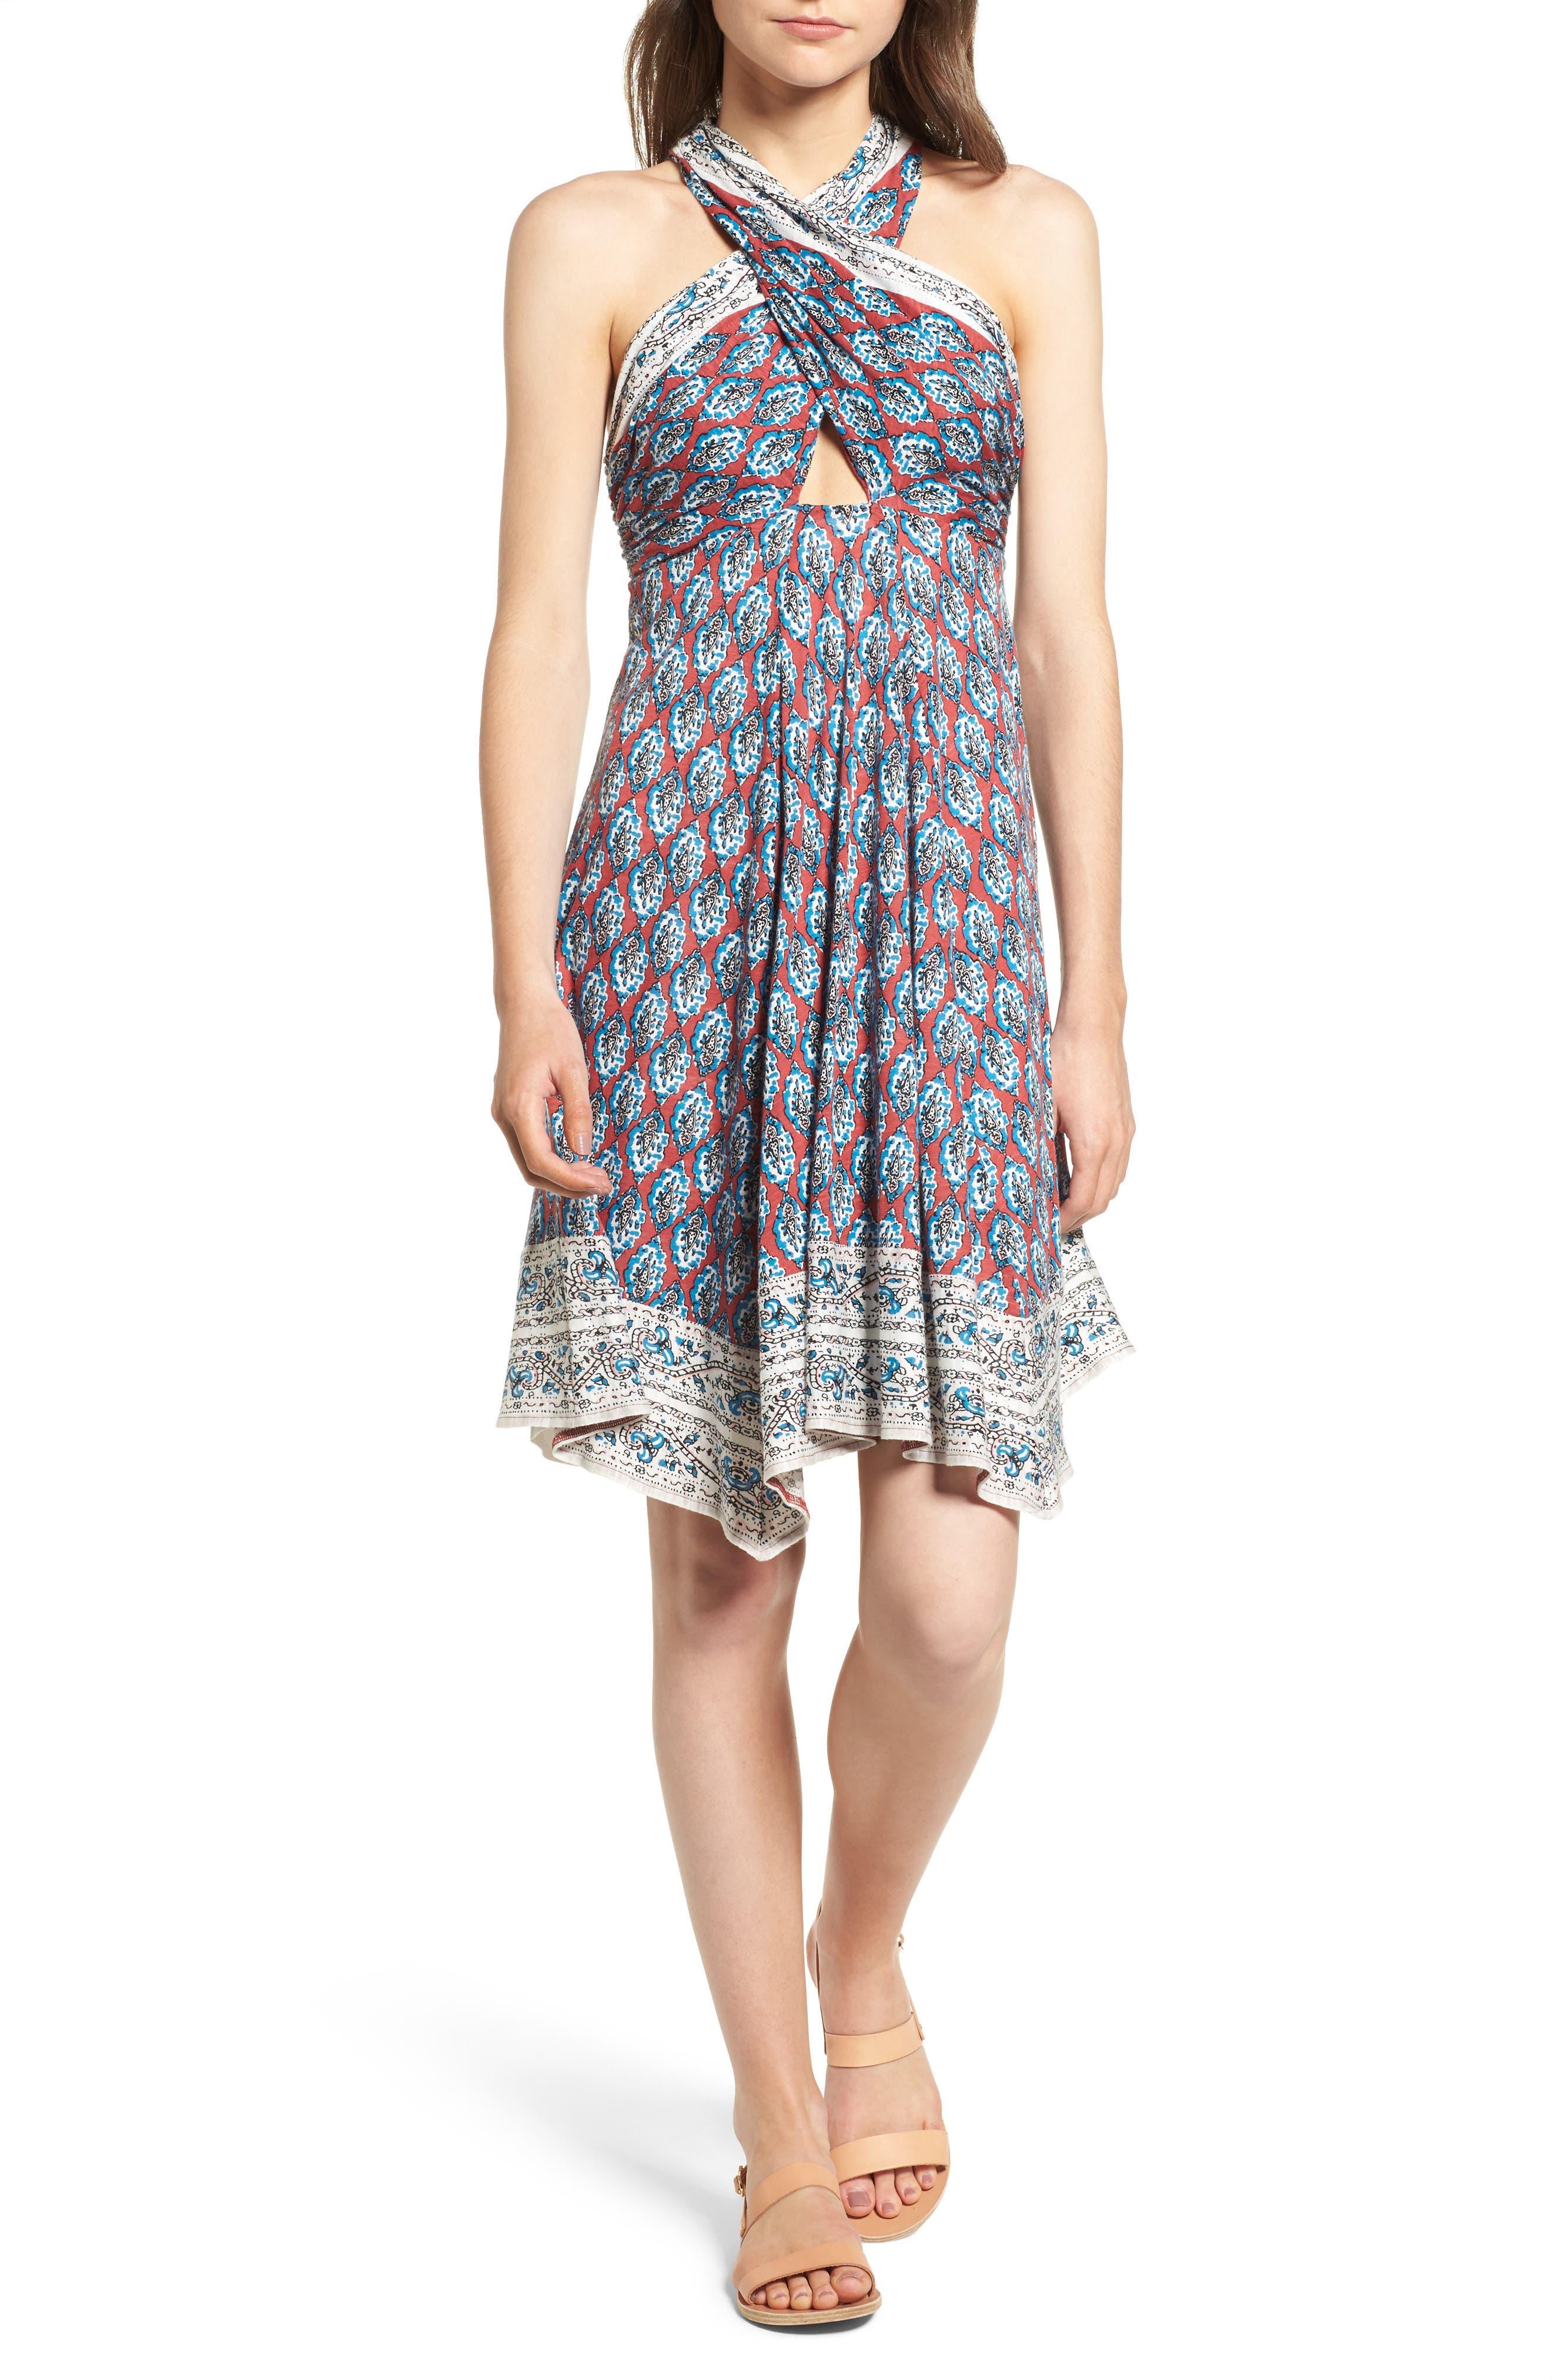 Ella Moss Bordeaux Tapestry Dress